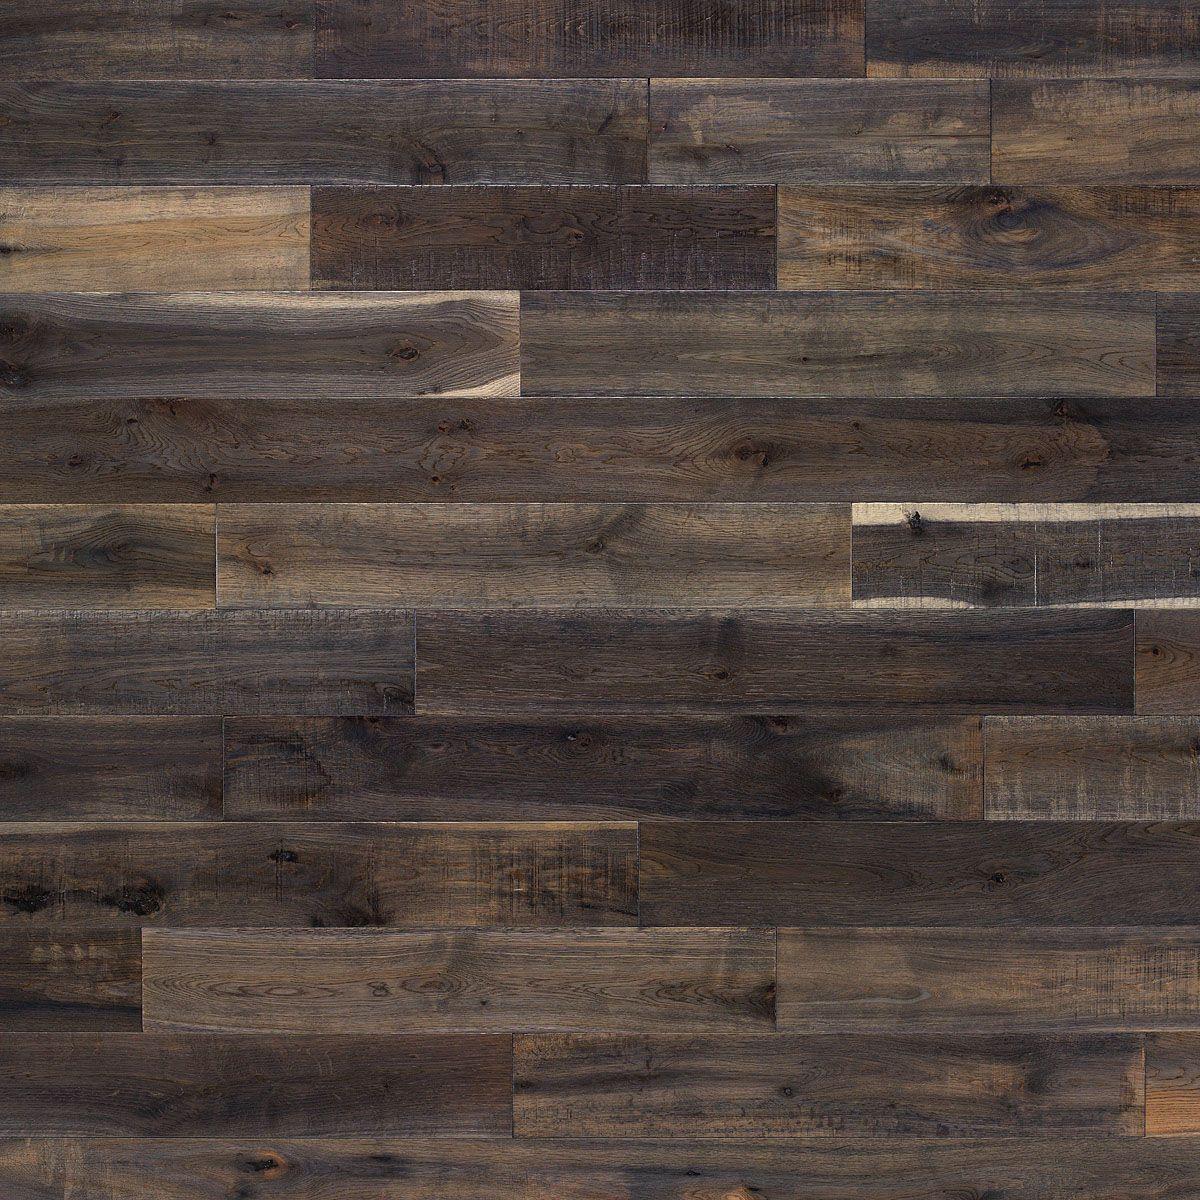 Antiqued Oak Coal Harbour | Kentwood Floors we have in the basement ...